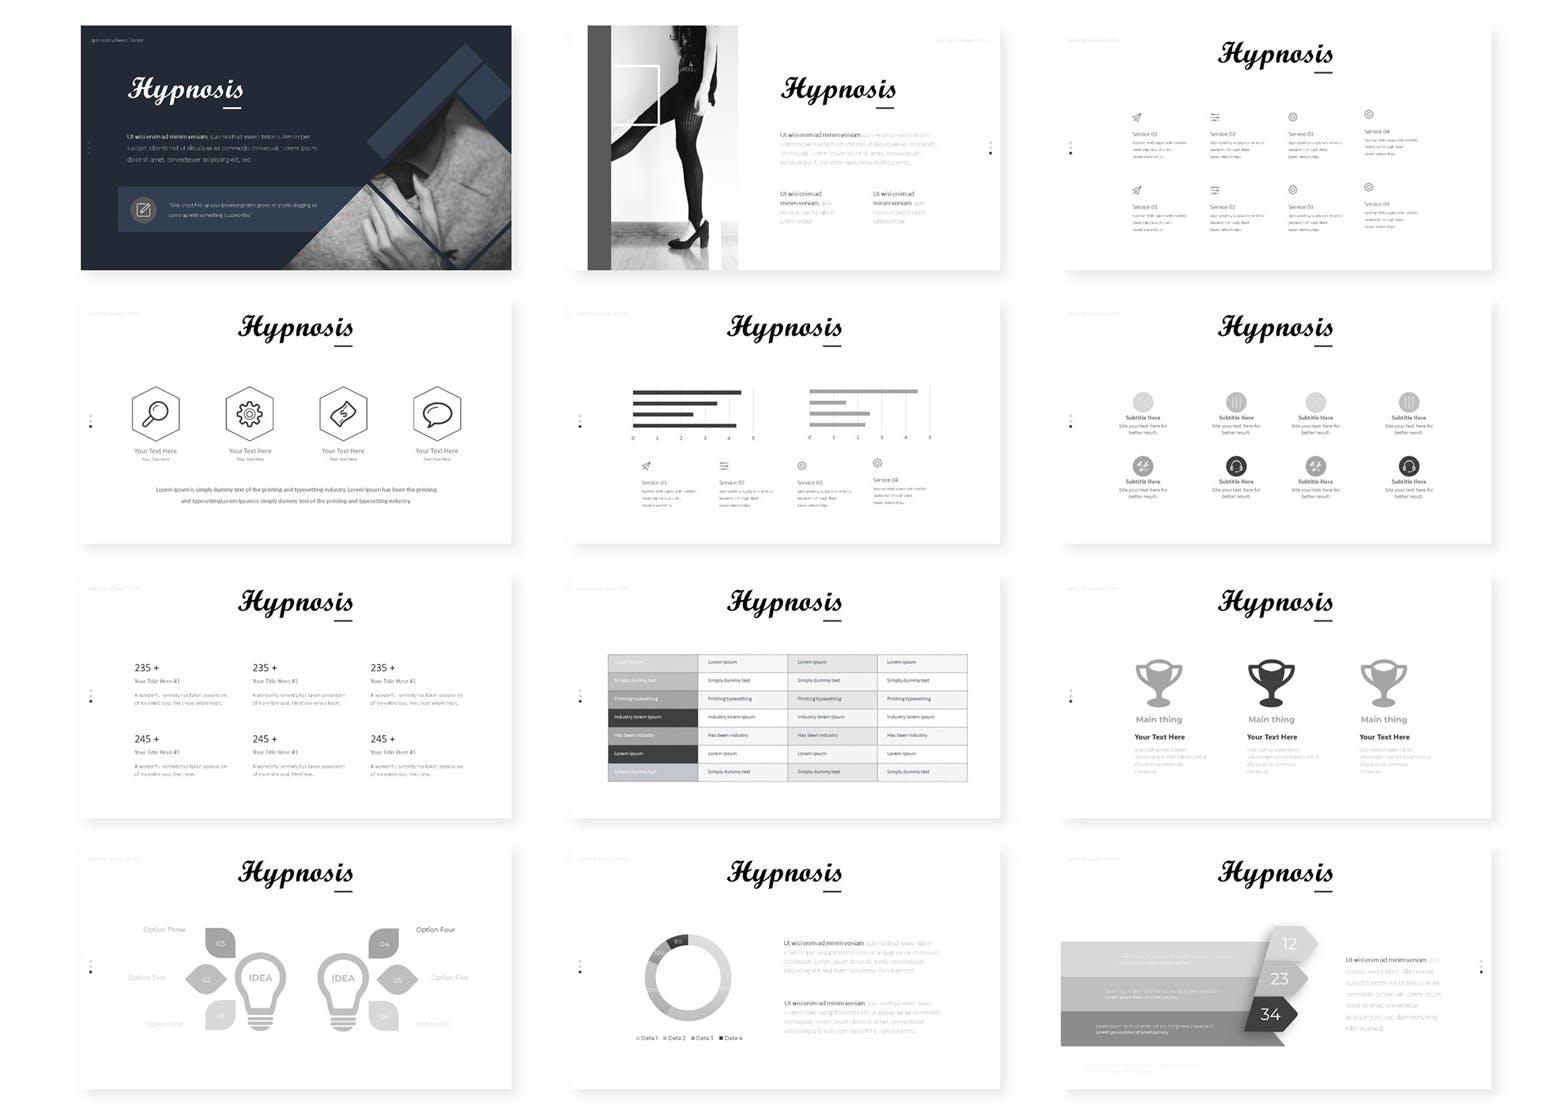 欧美现代时尚风格PPT模版  Hypnosis - Powerpoint Template